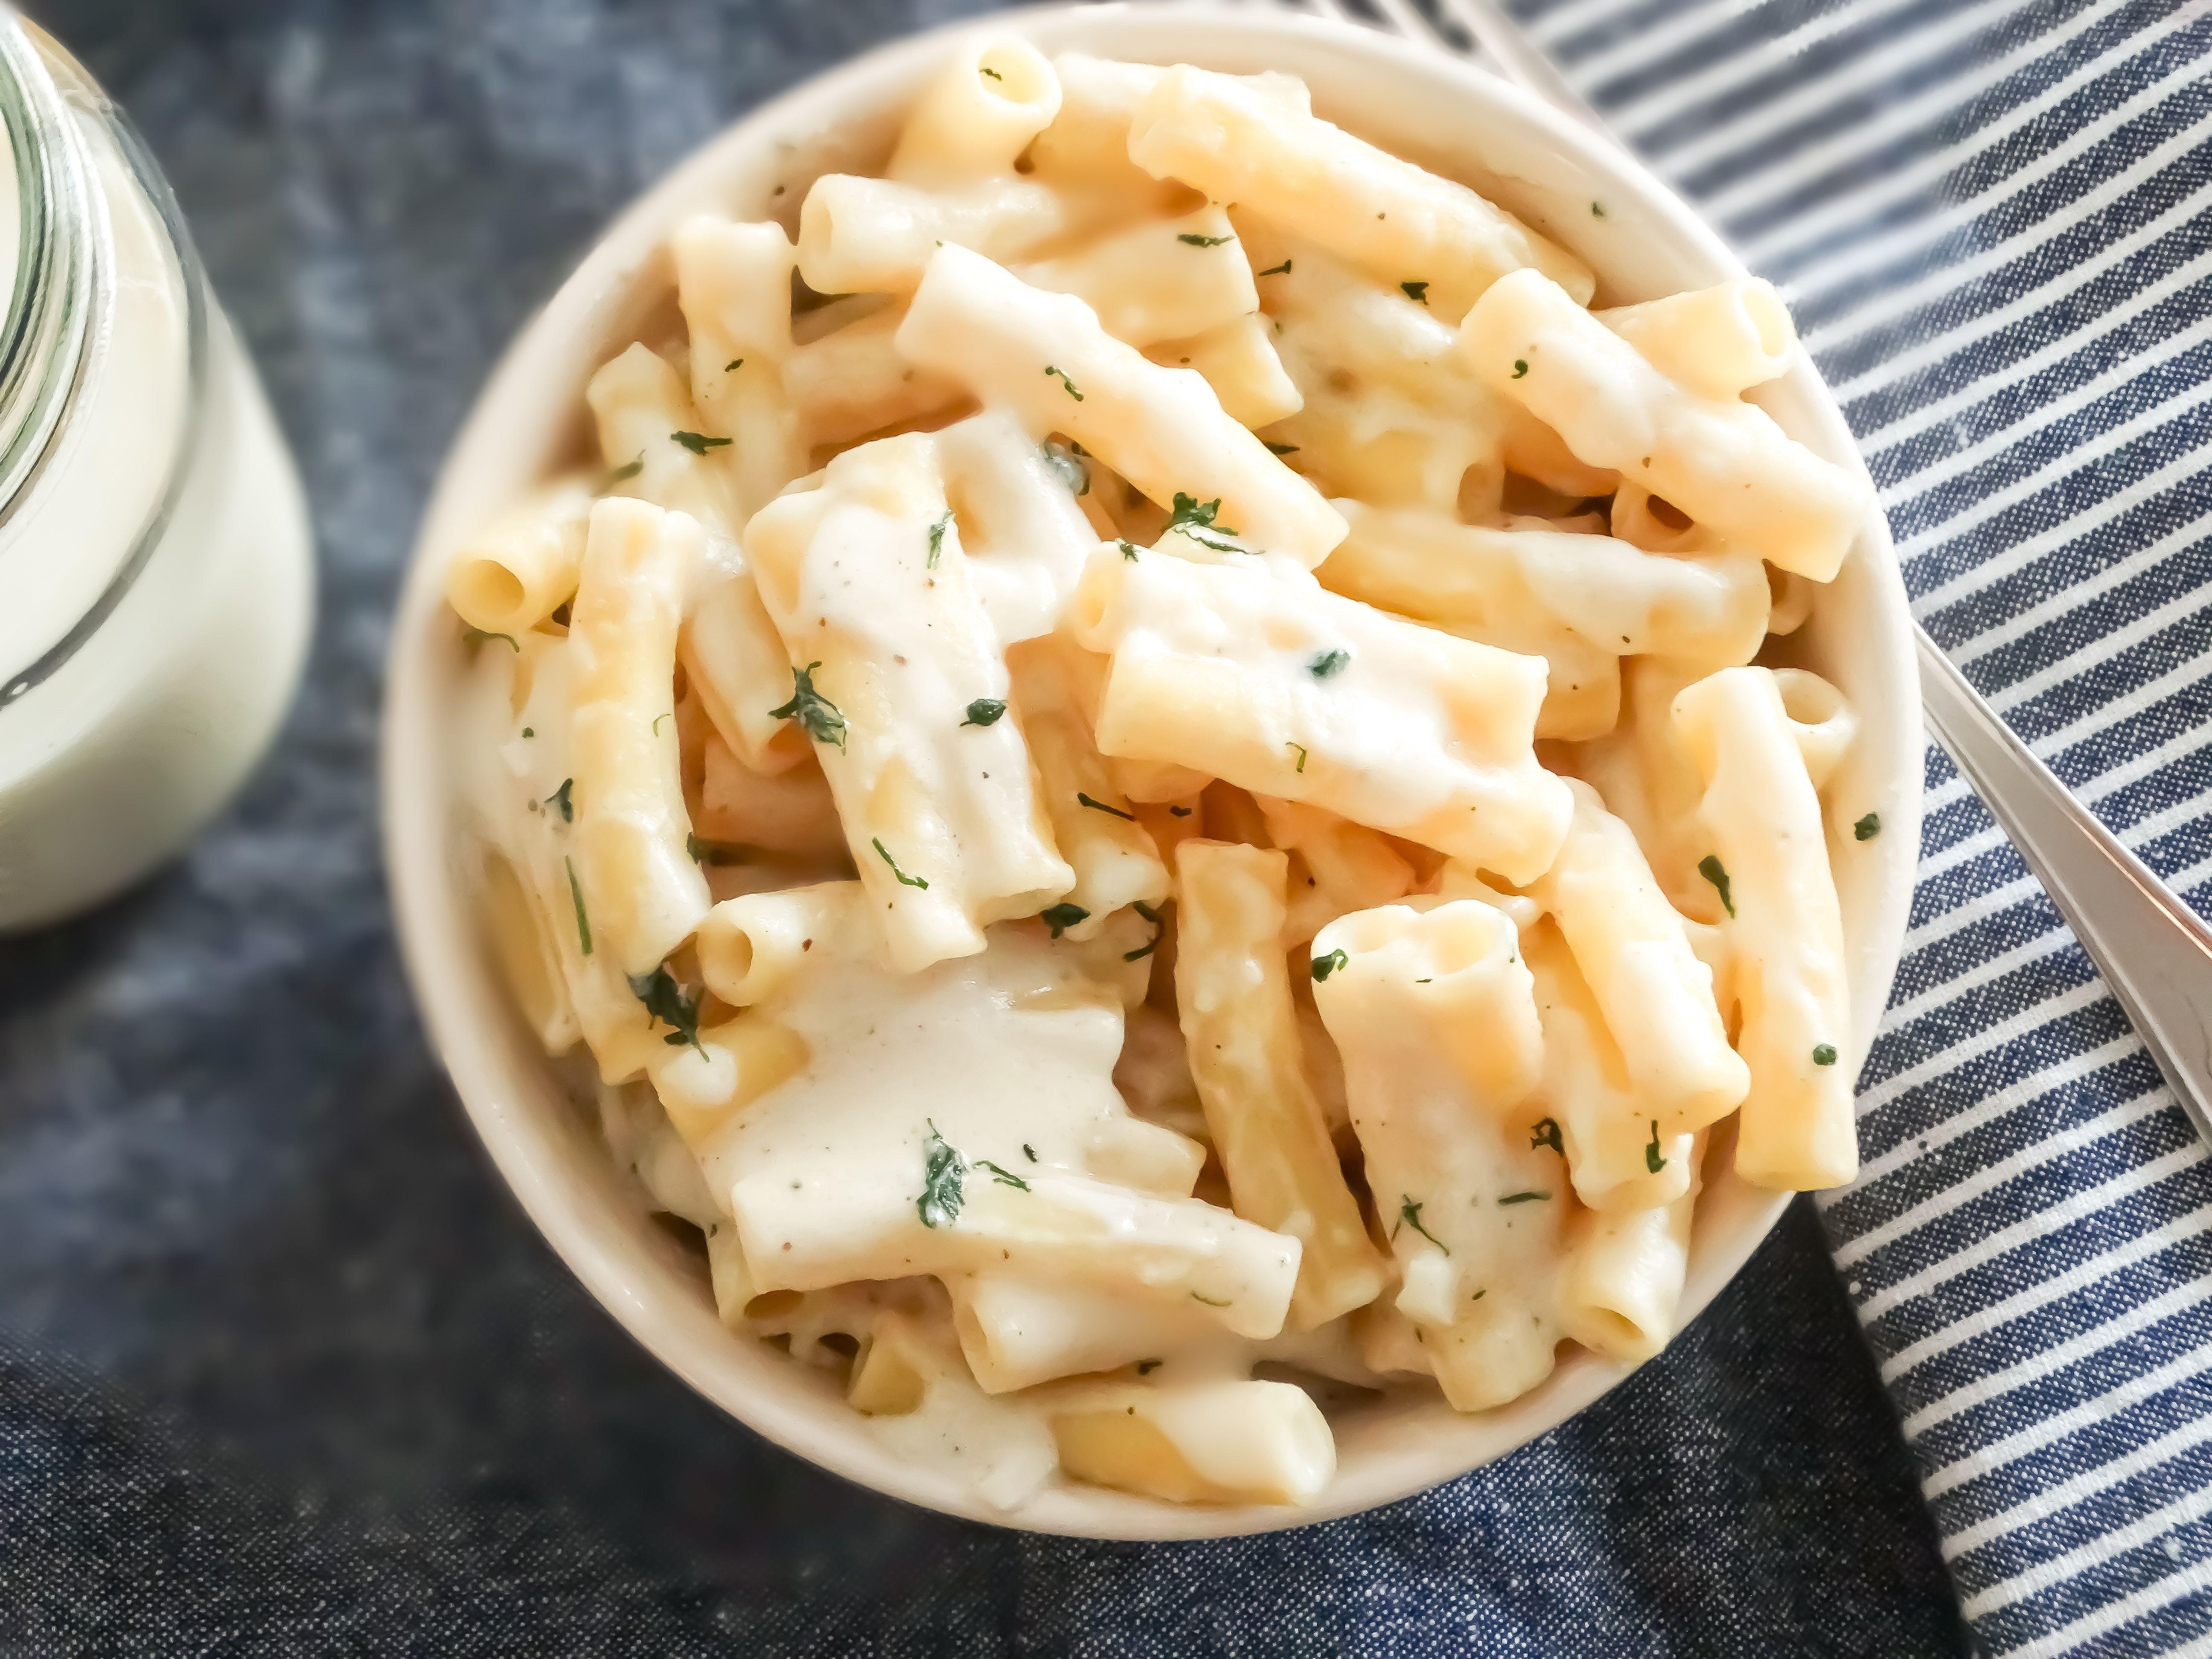 White Cream Sauce With Milk Quick Dinner Ideas Tasty Oven Creamy Pasta Sauce Cream Sauce Pasta White Sauce Recipes